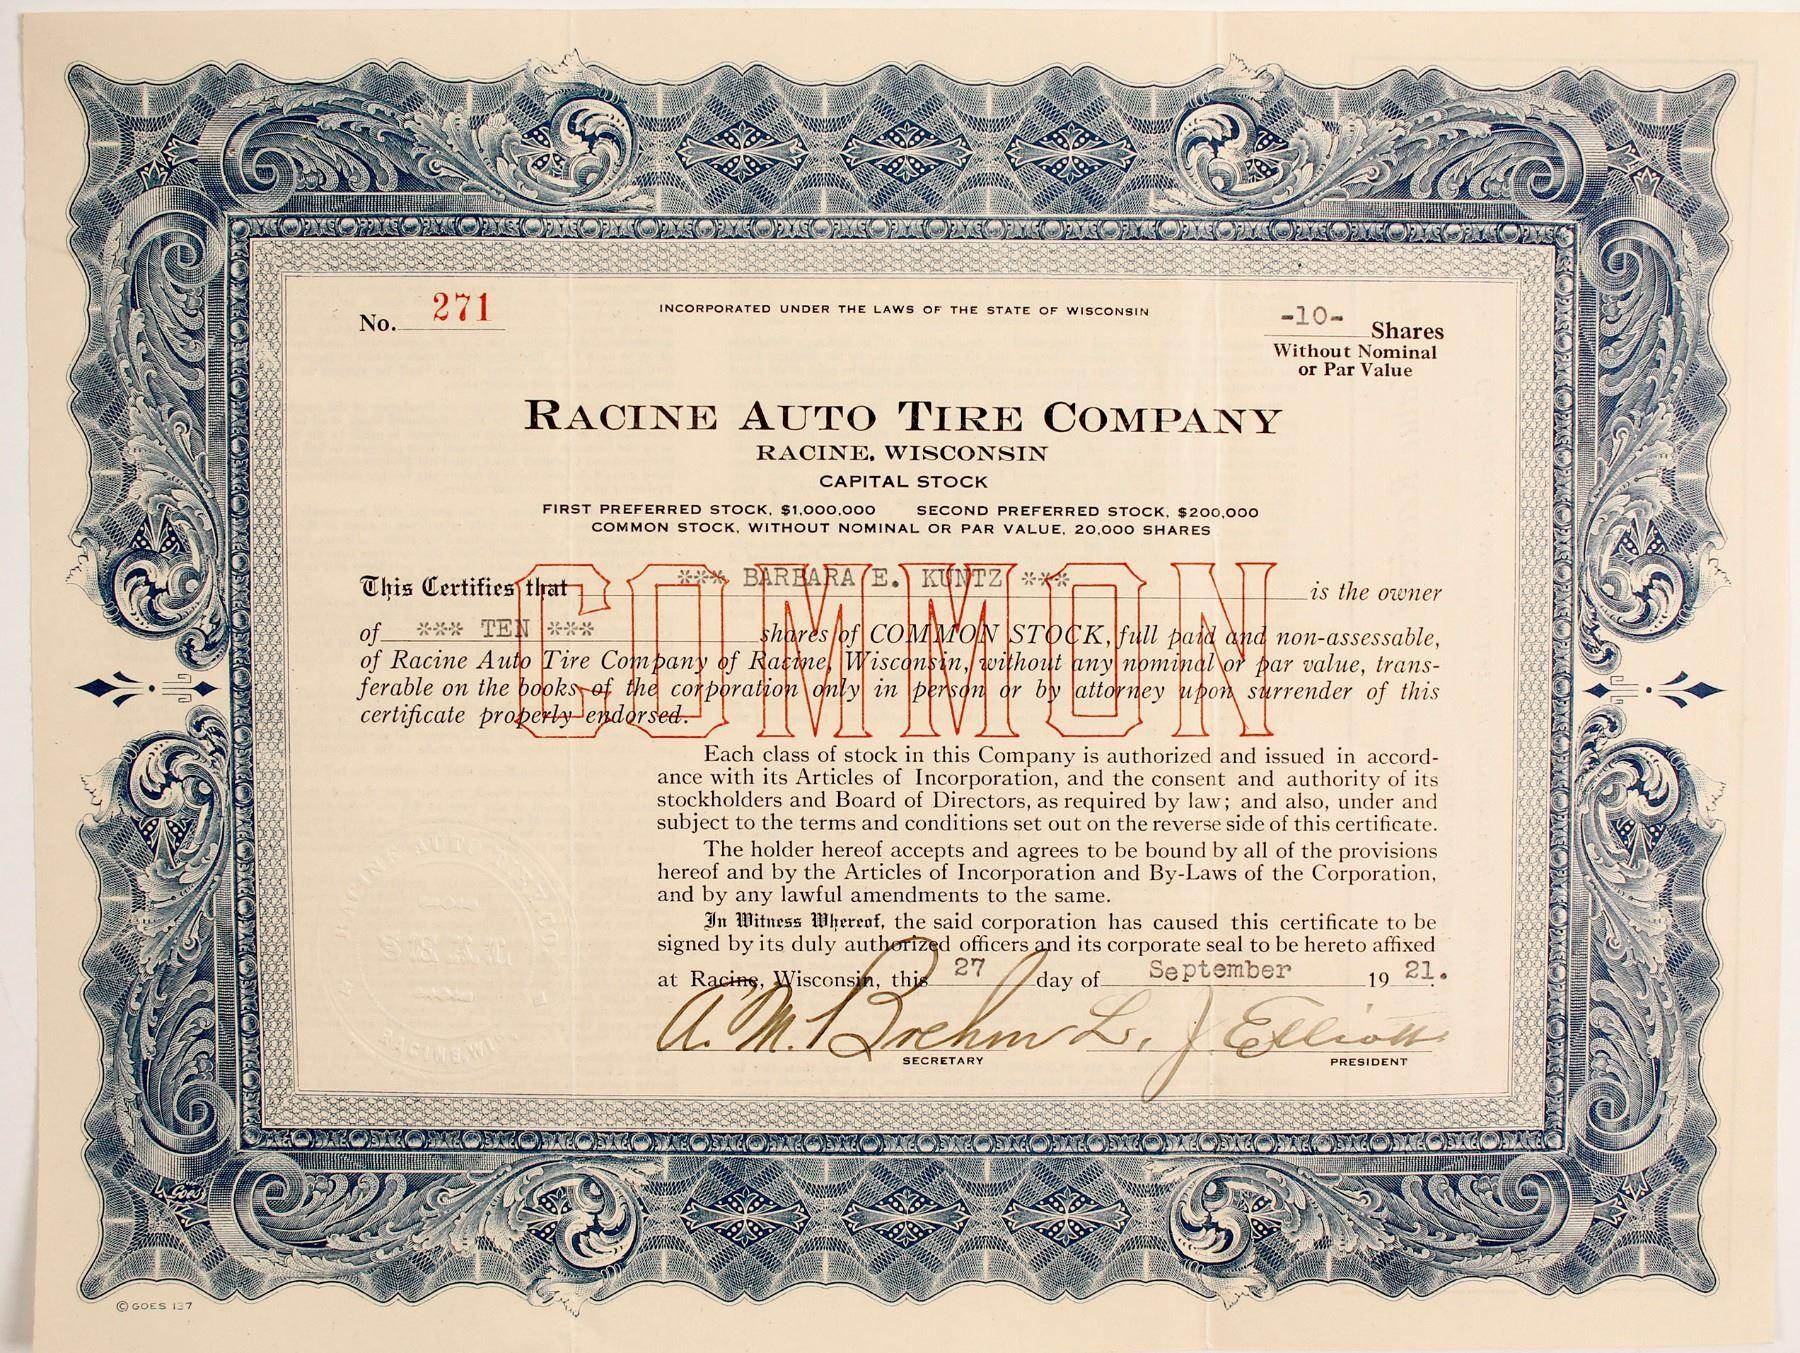 Racine Auto Tire Company (89763)